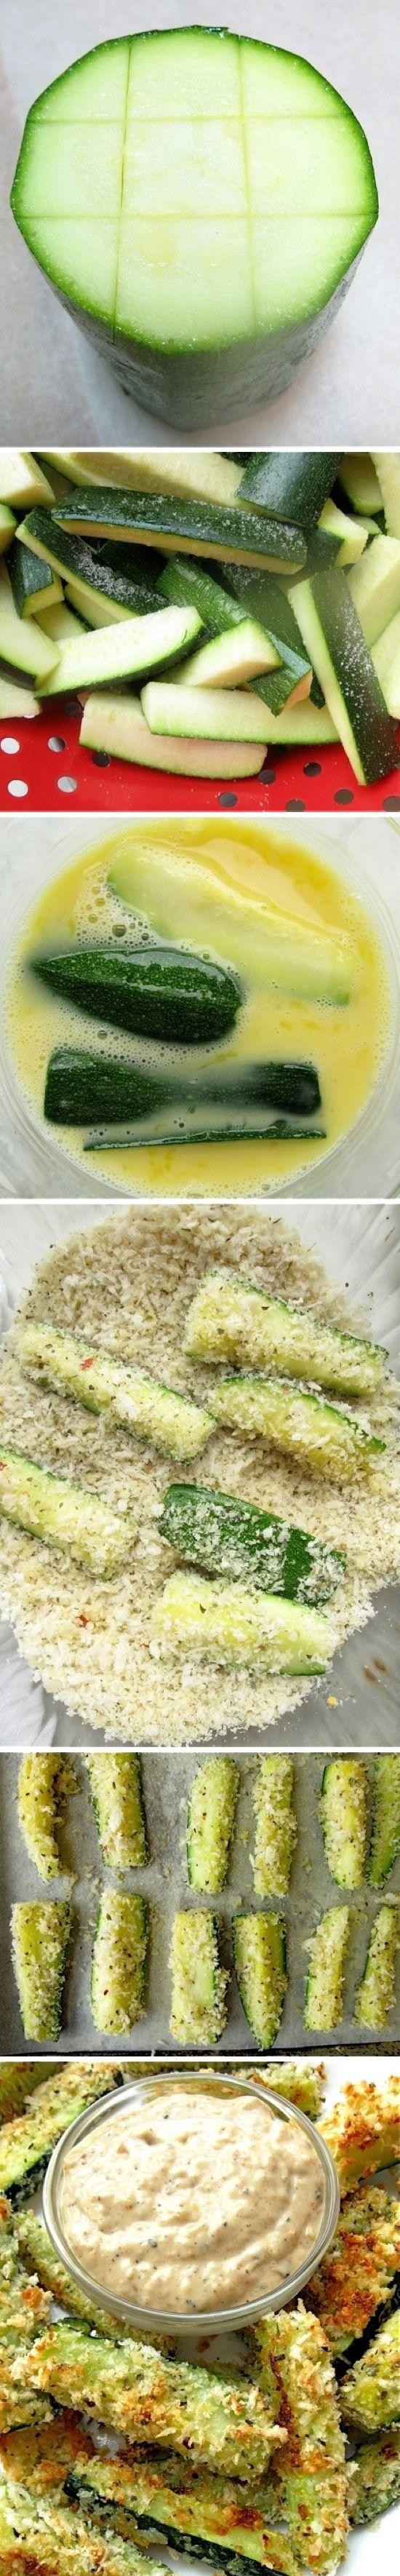 Baked Zucchini Sticks | Recipe By Photo